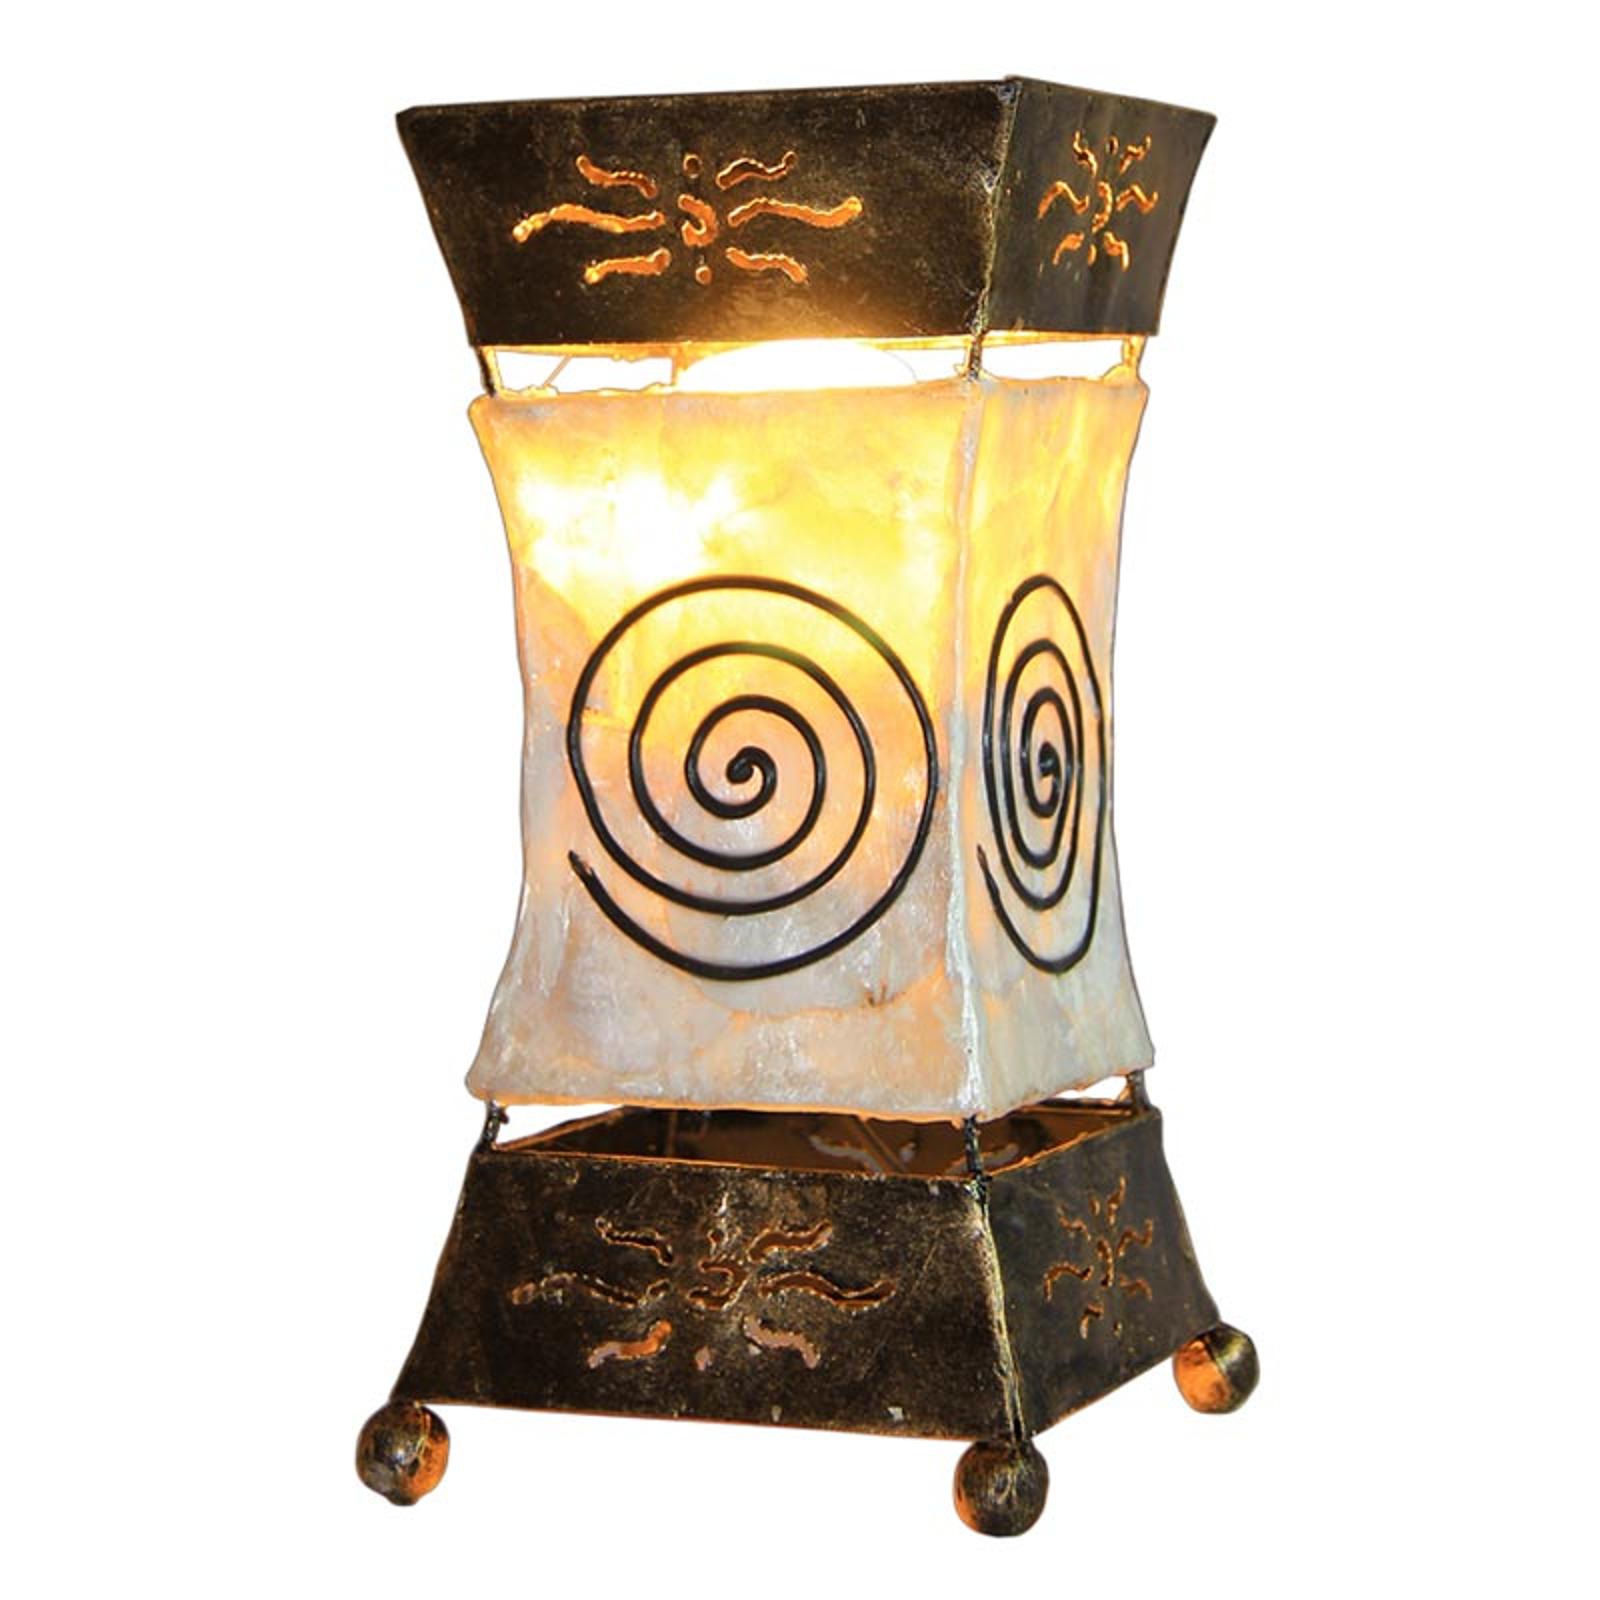 Helle tafellamp Xenia met spiraalmotief